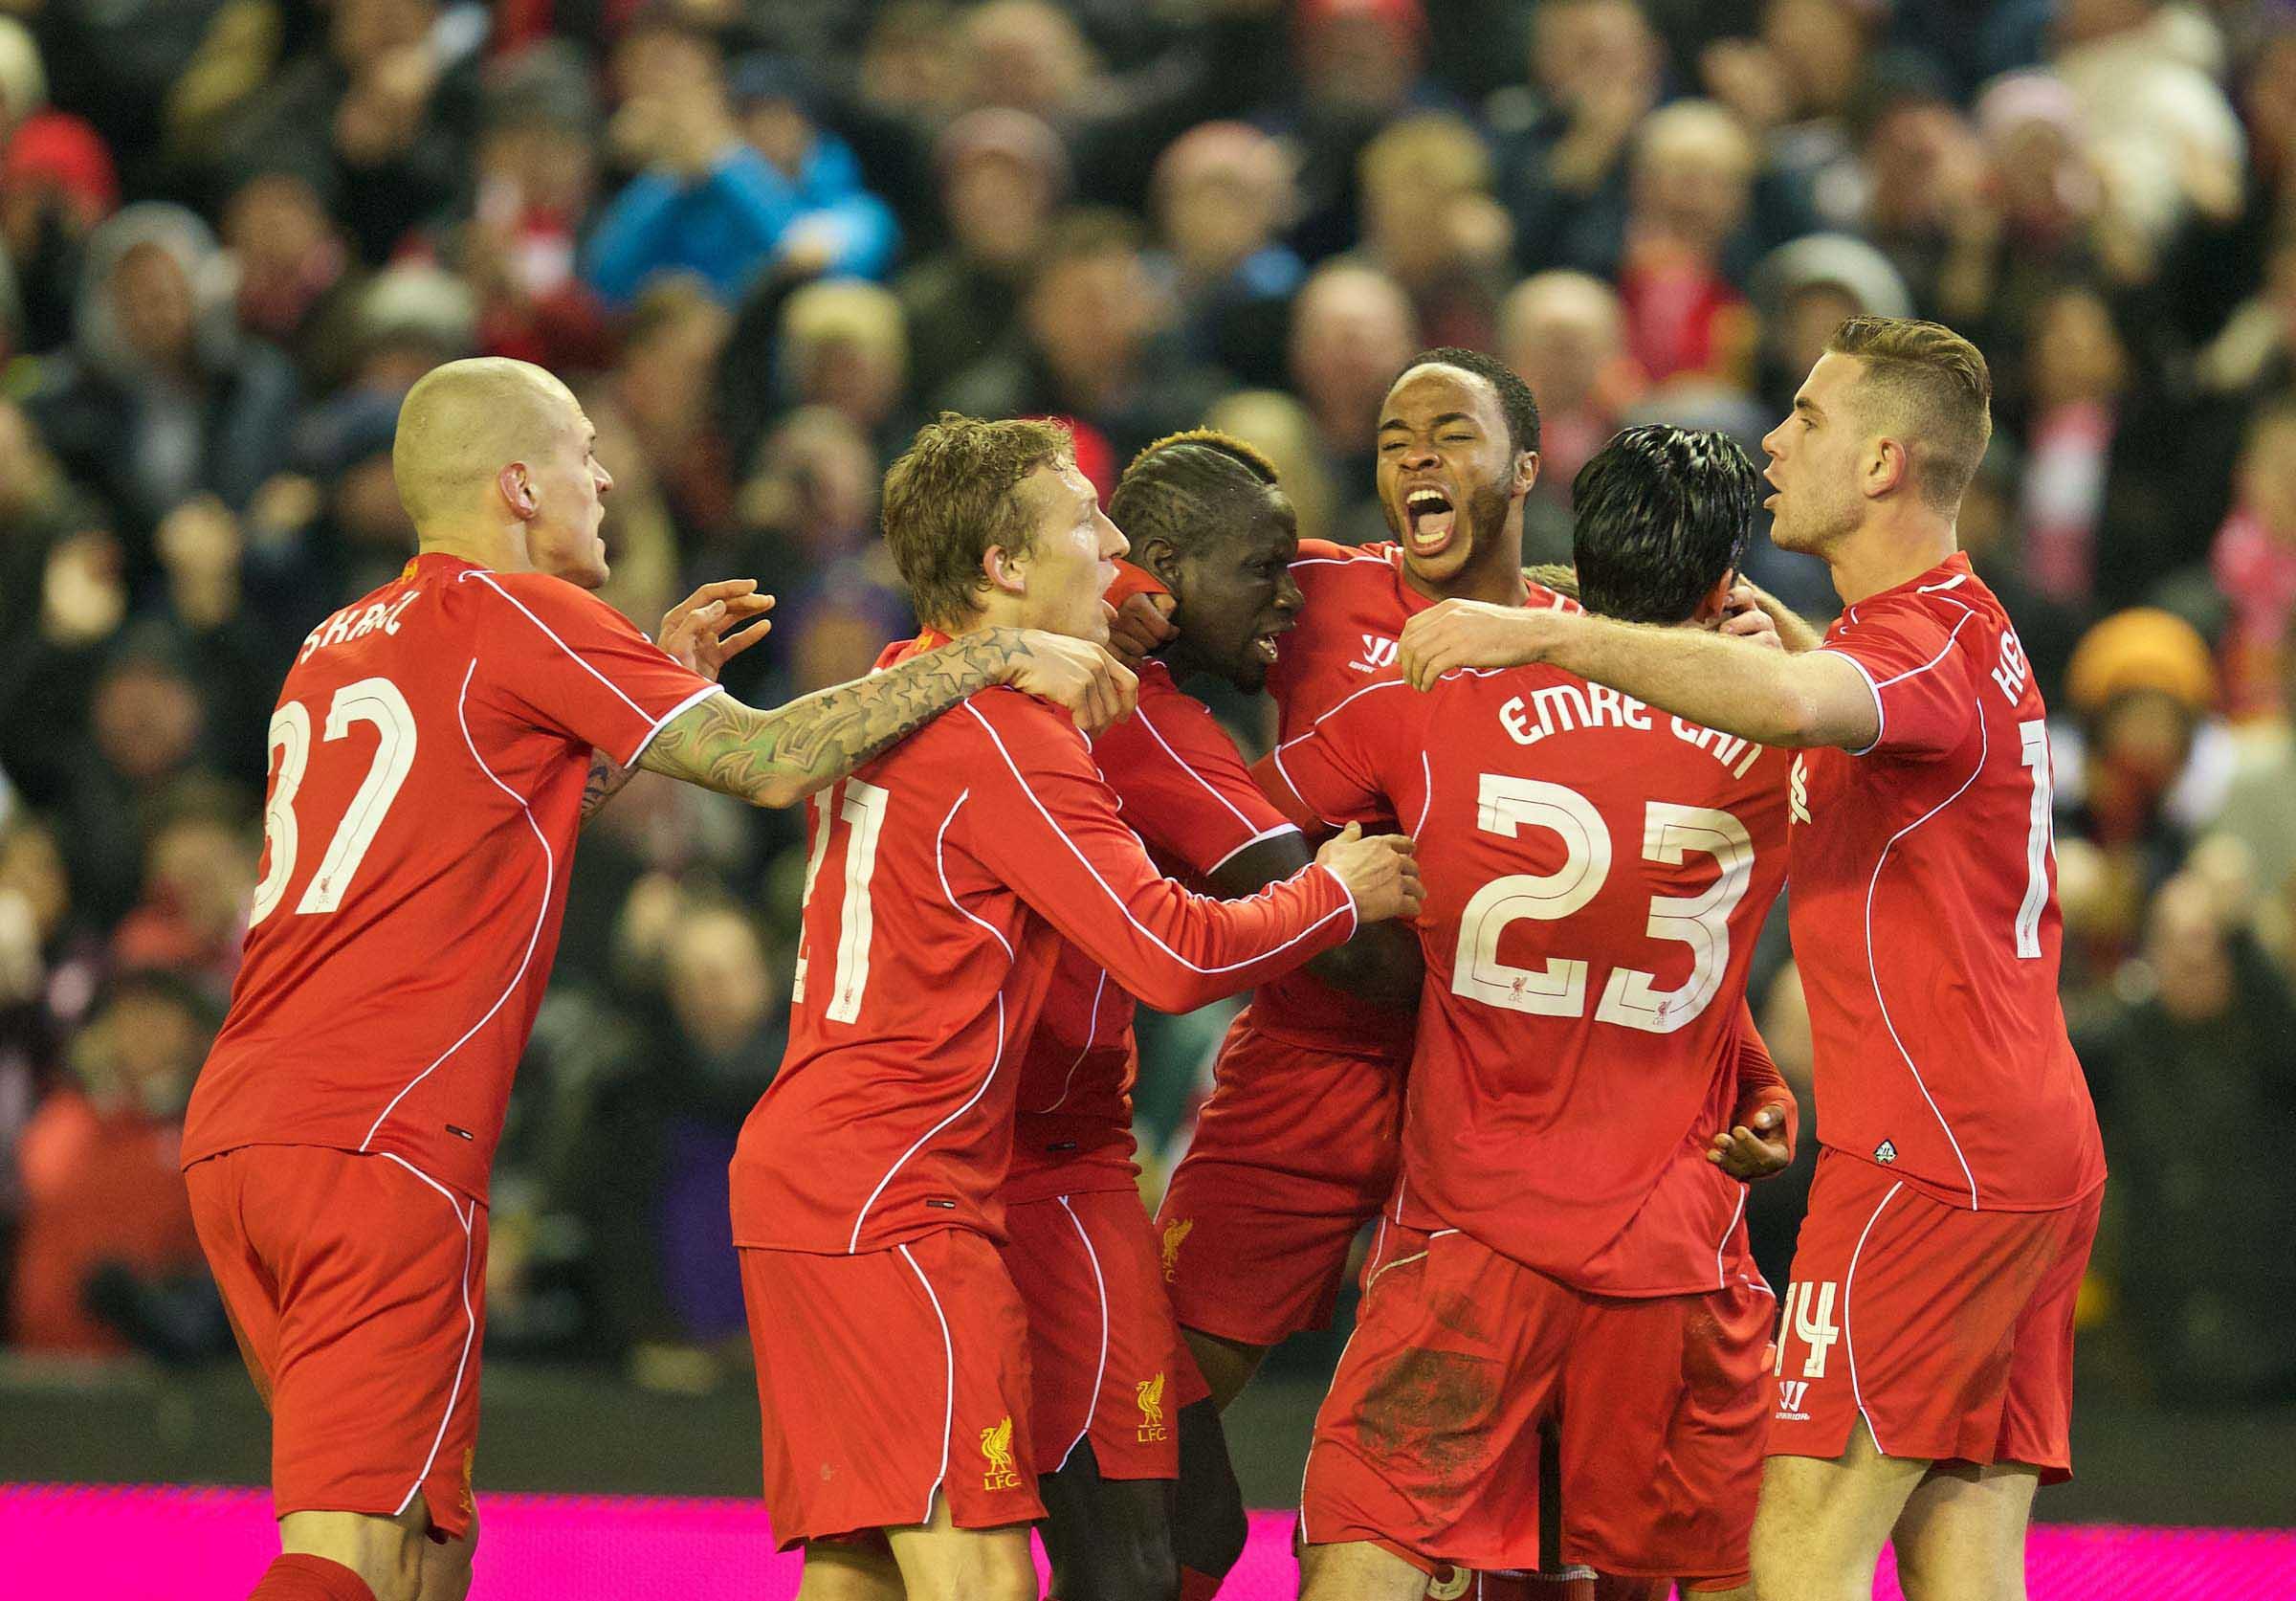 Football - Football League Cup - Semi-Final 1st Leg - Liverpool FC v Chelsea FC